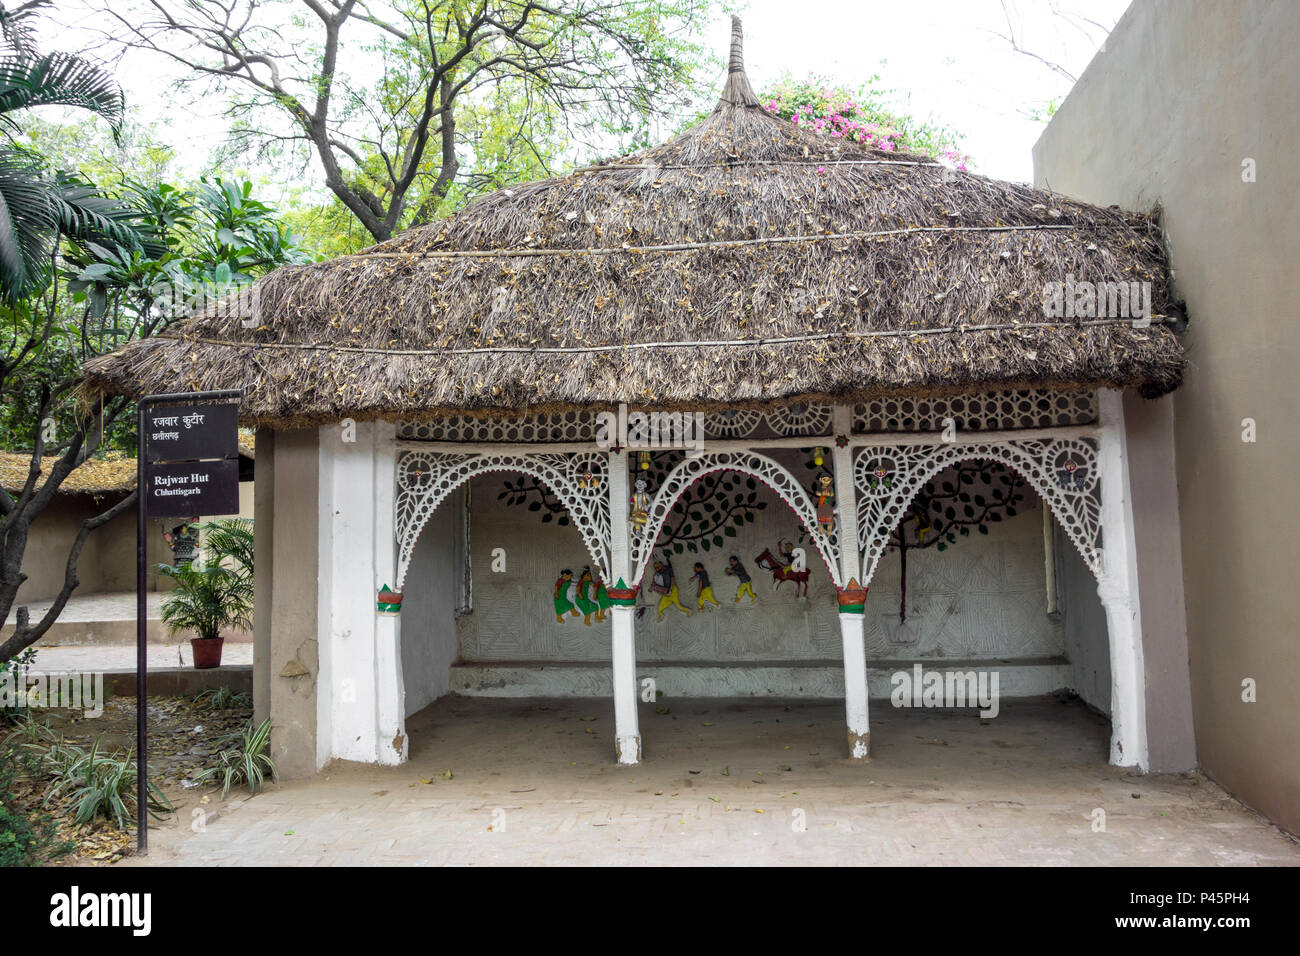 Exhibit of a Rajwar hut from Chhattisgarh in the National Crafts Museum, New Delhi, India - Stock Image